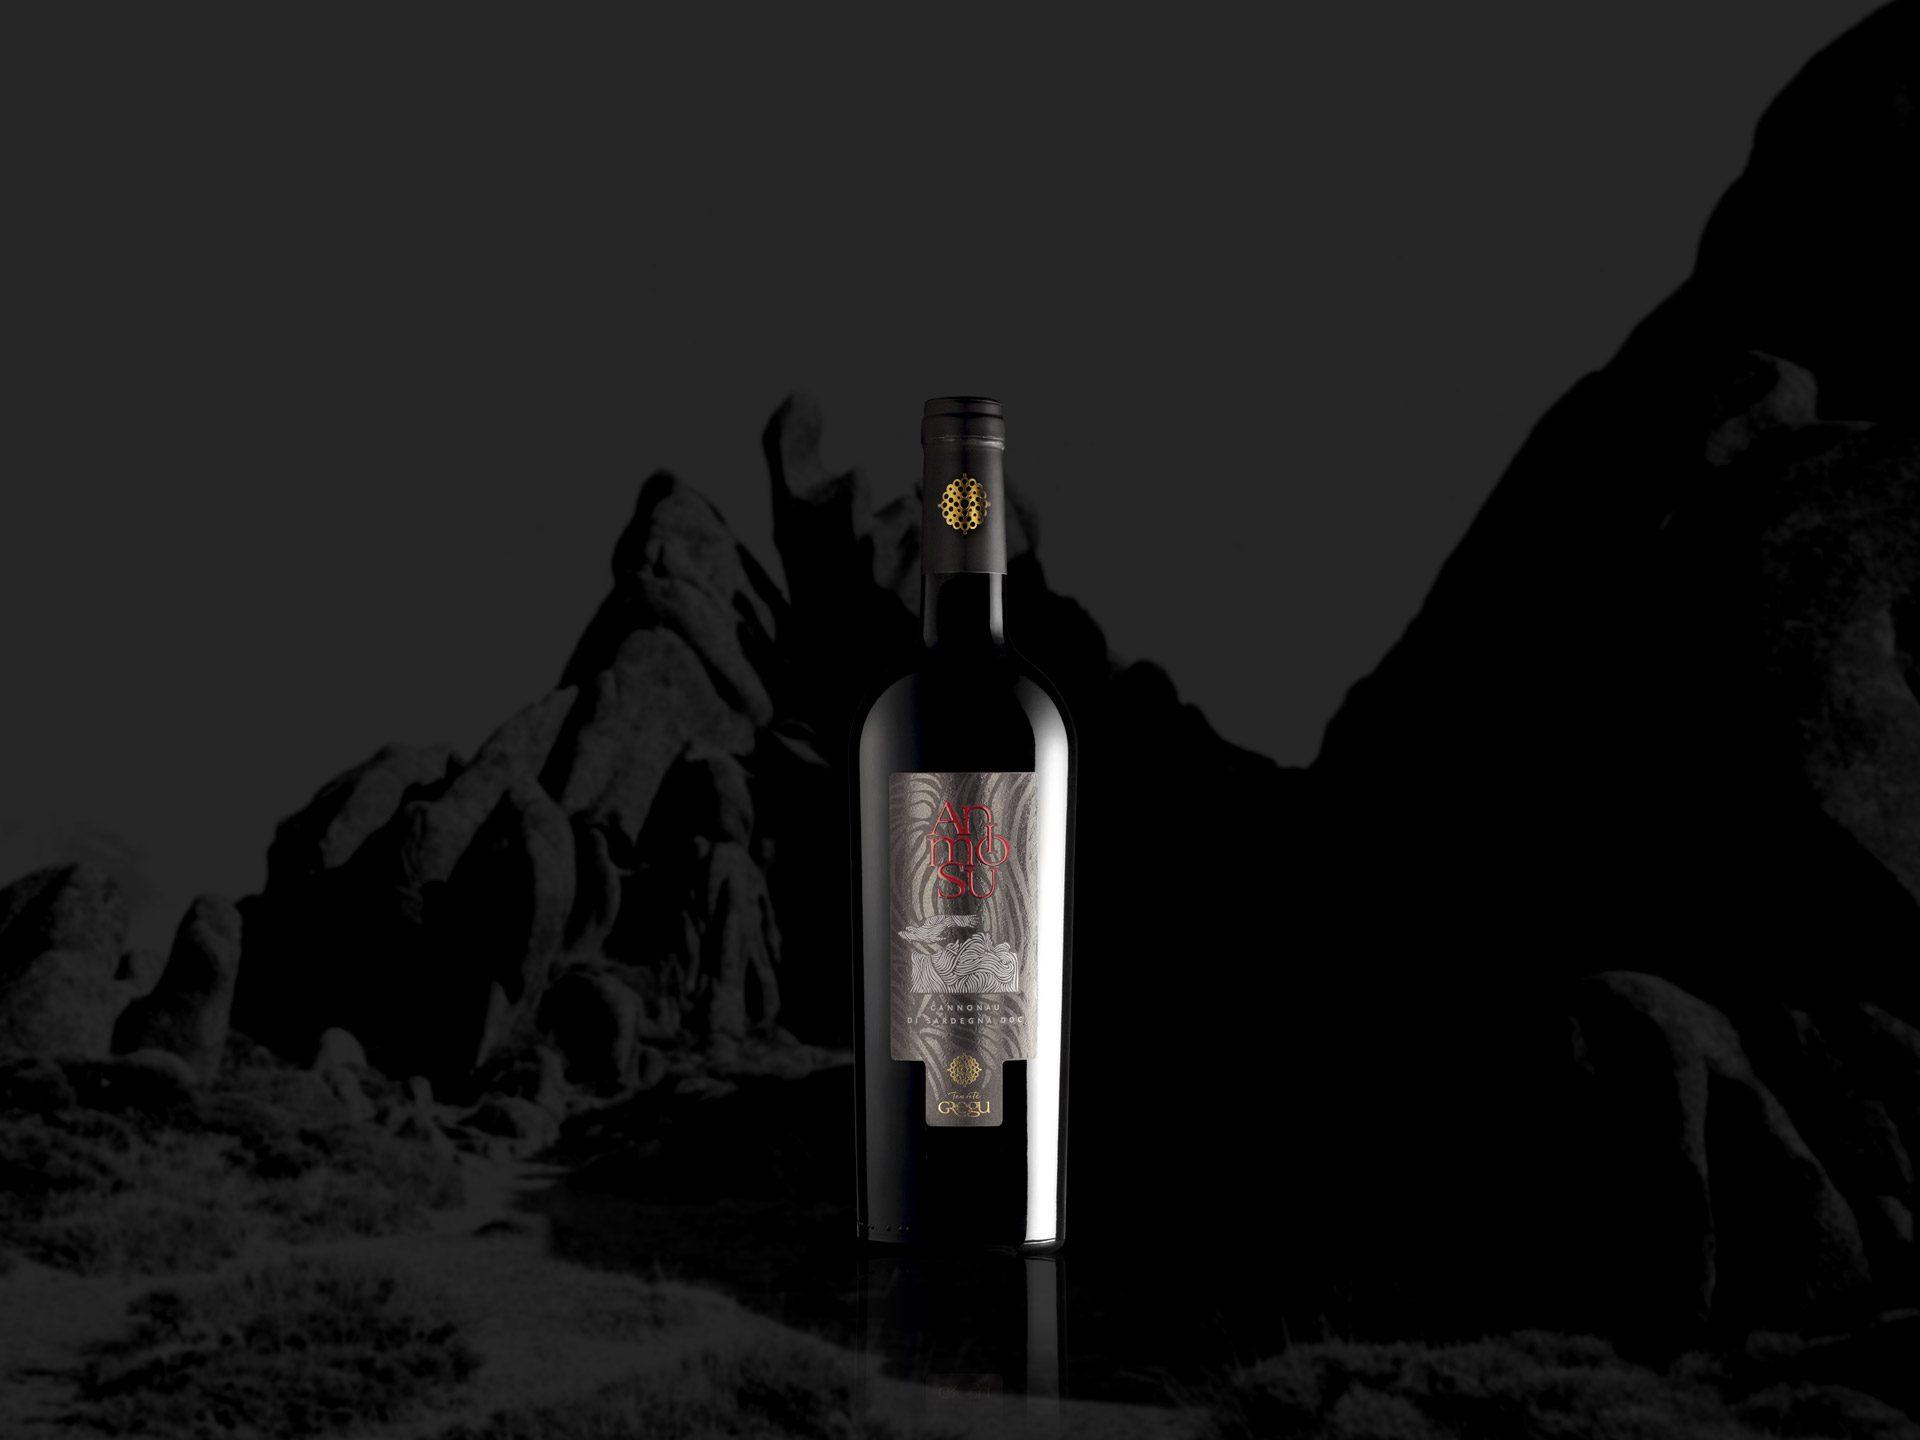 Etichetta vino Animosu - Tenute Gregu